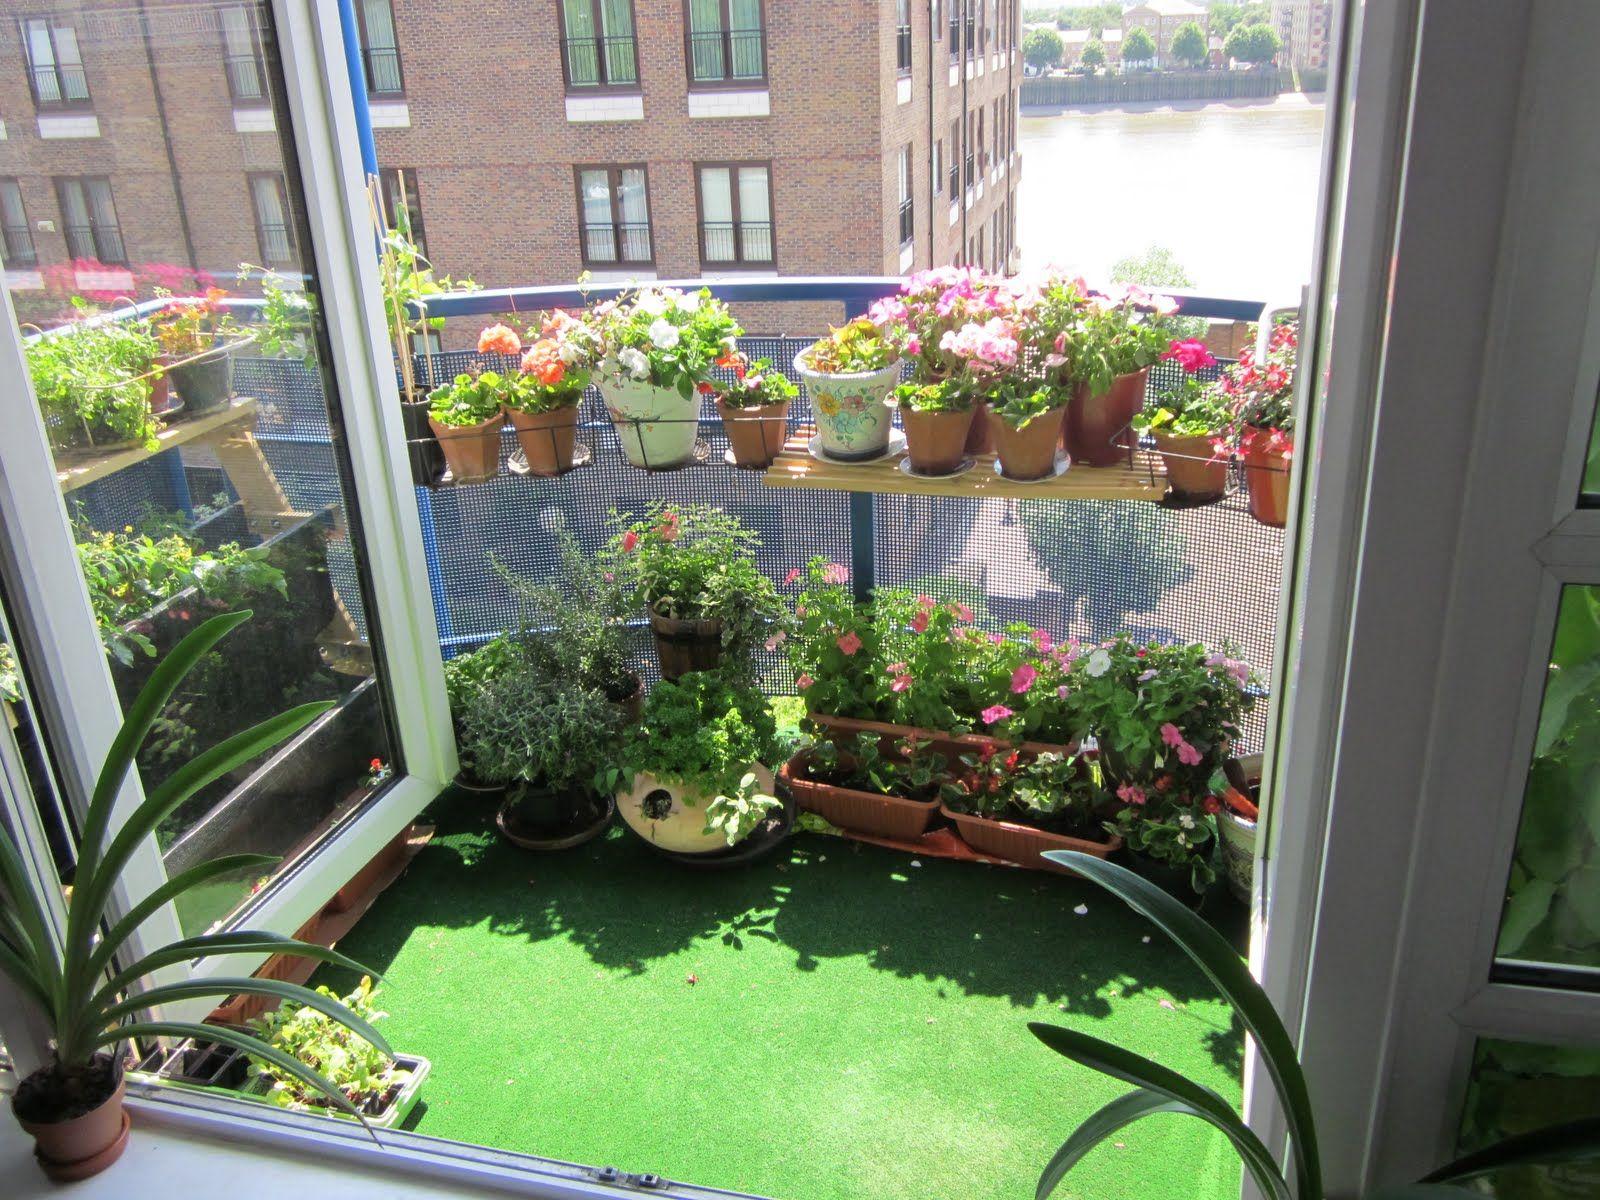 Apartments Balcony Garden Apartment Balcony Ideas - noqtr ... on Apartment Backyard Patio Ideas  id=68051